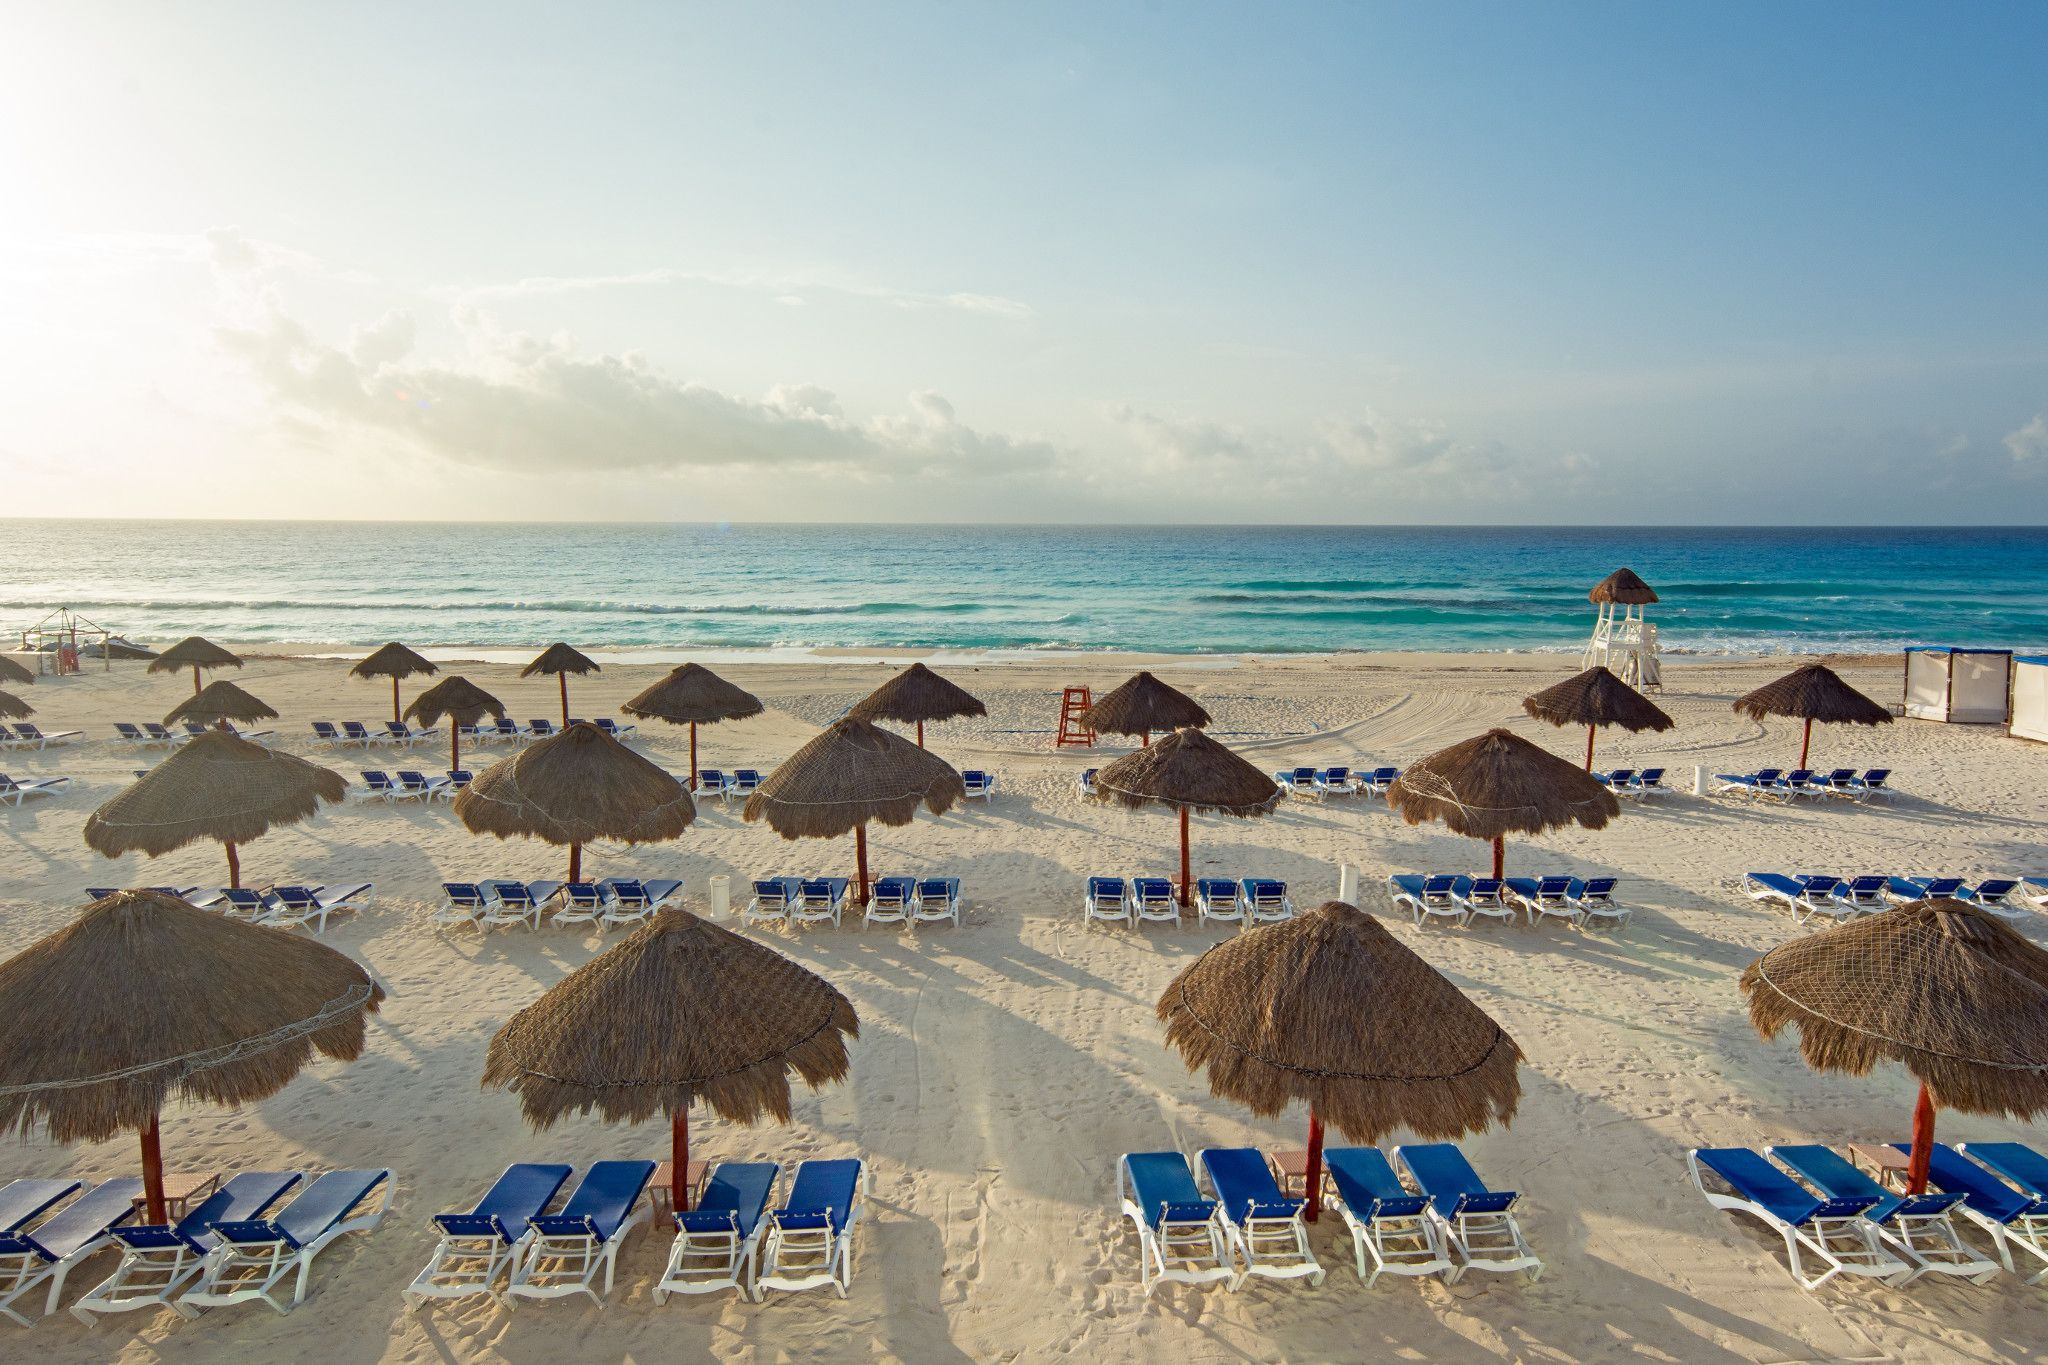 Travelocity.com Sunset Royal Beach Resort - All Inclusive, Cancun (per night)